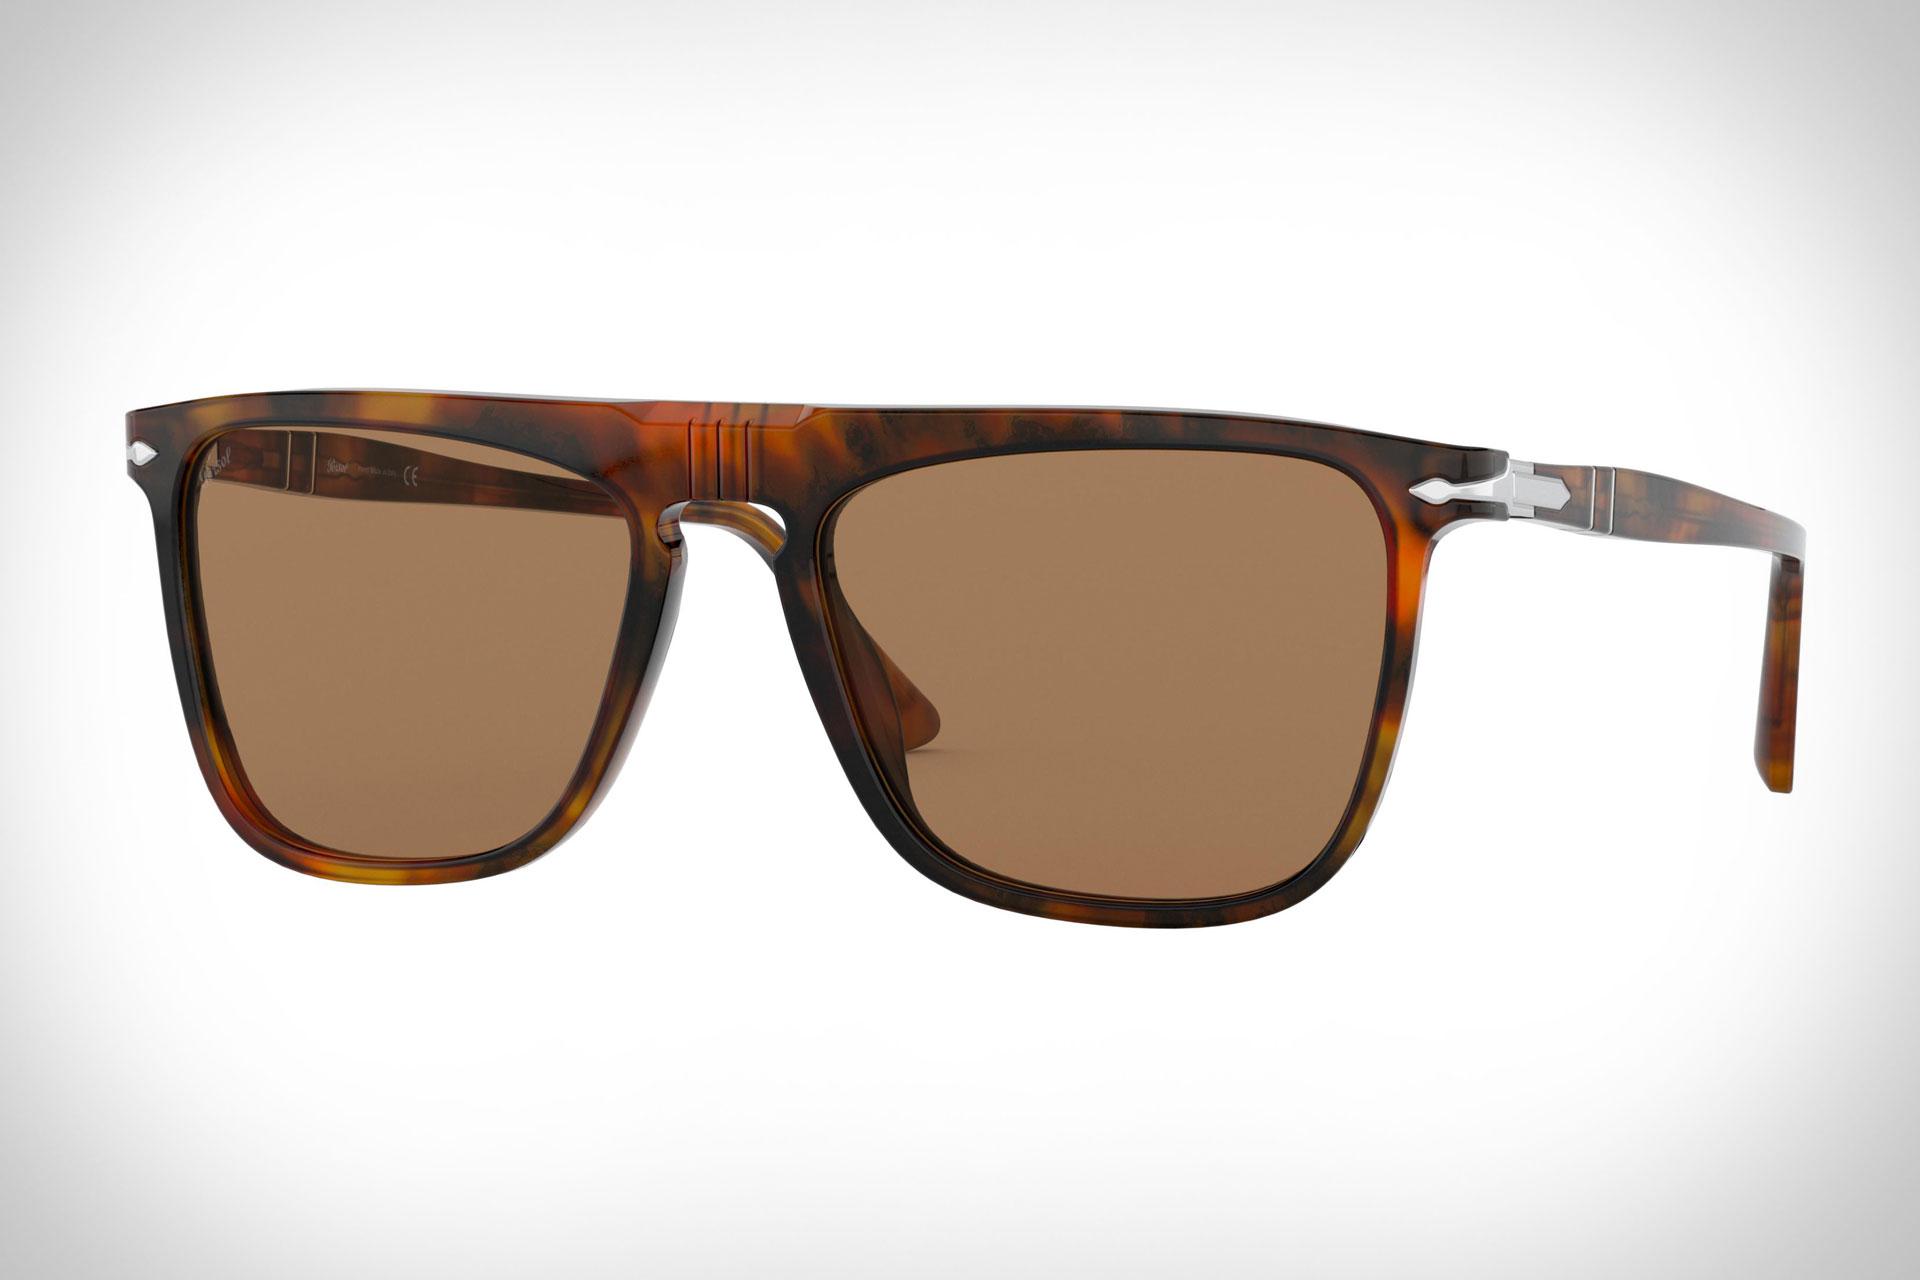 66548d77fea Persol PO3225S Cocktail Sunglasses | Uncrate